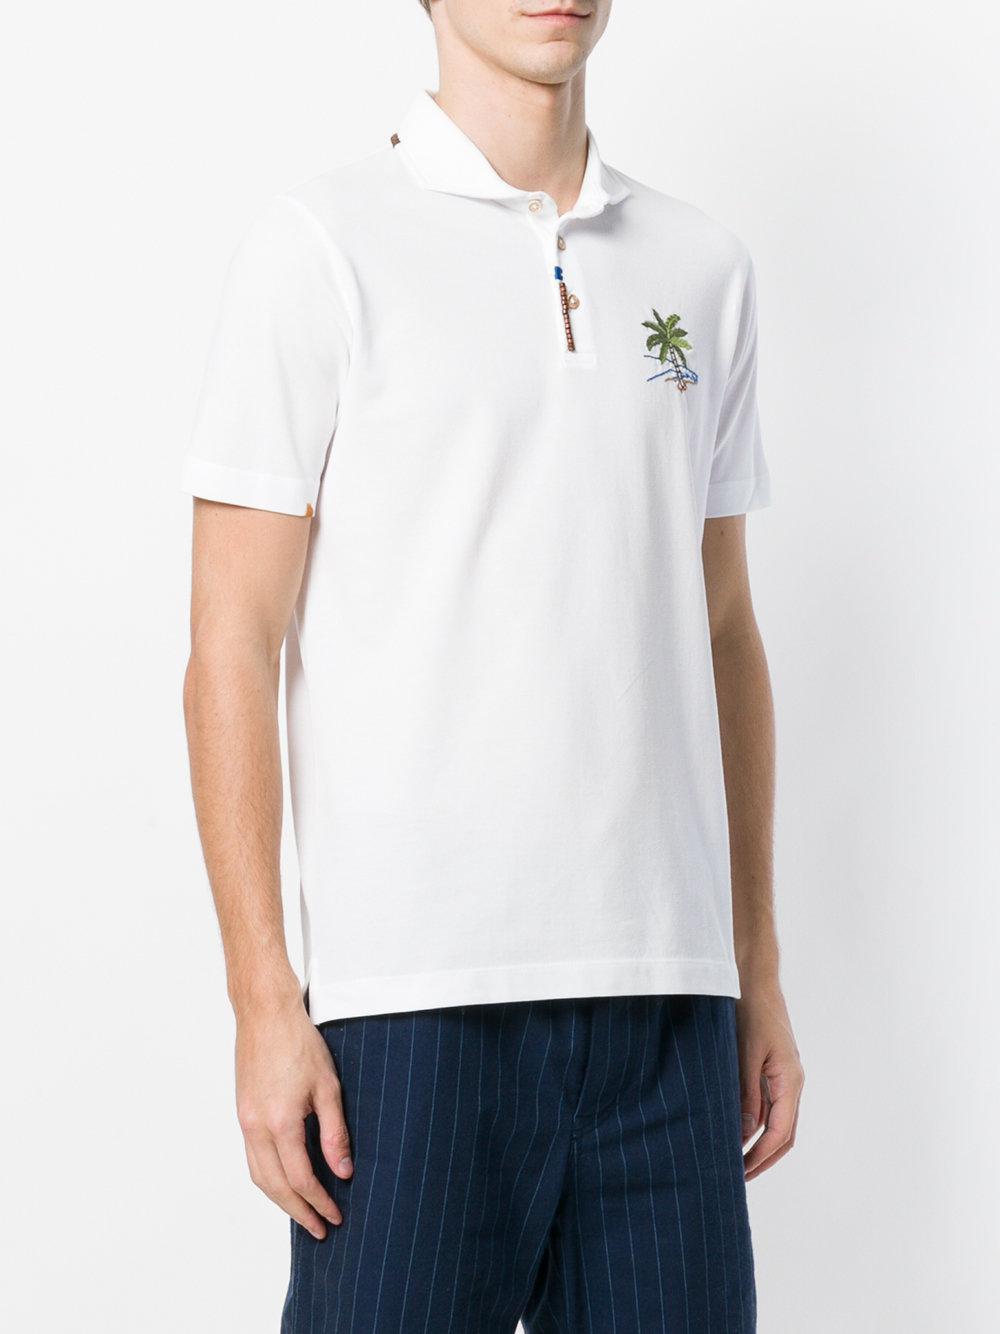 Altea White Cotton Polo Shirt for Men